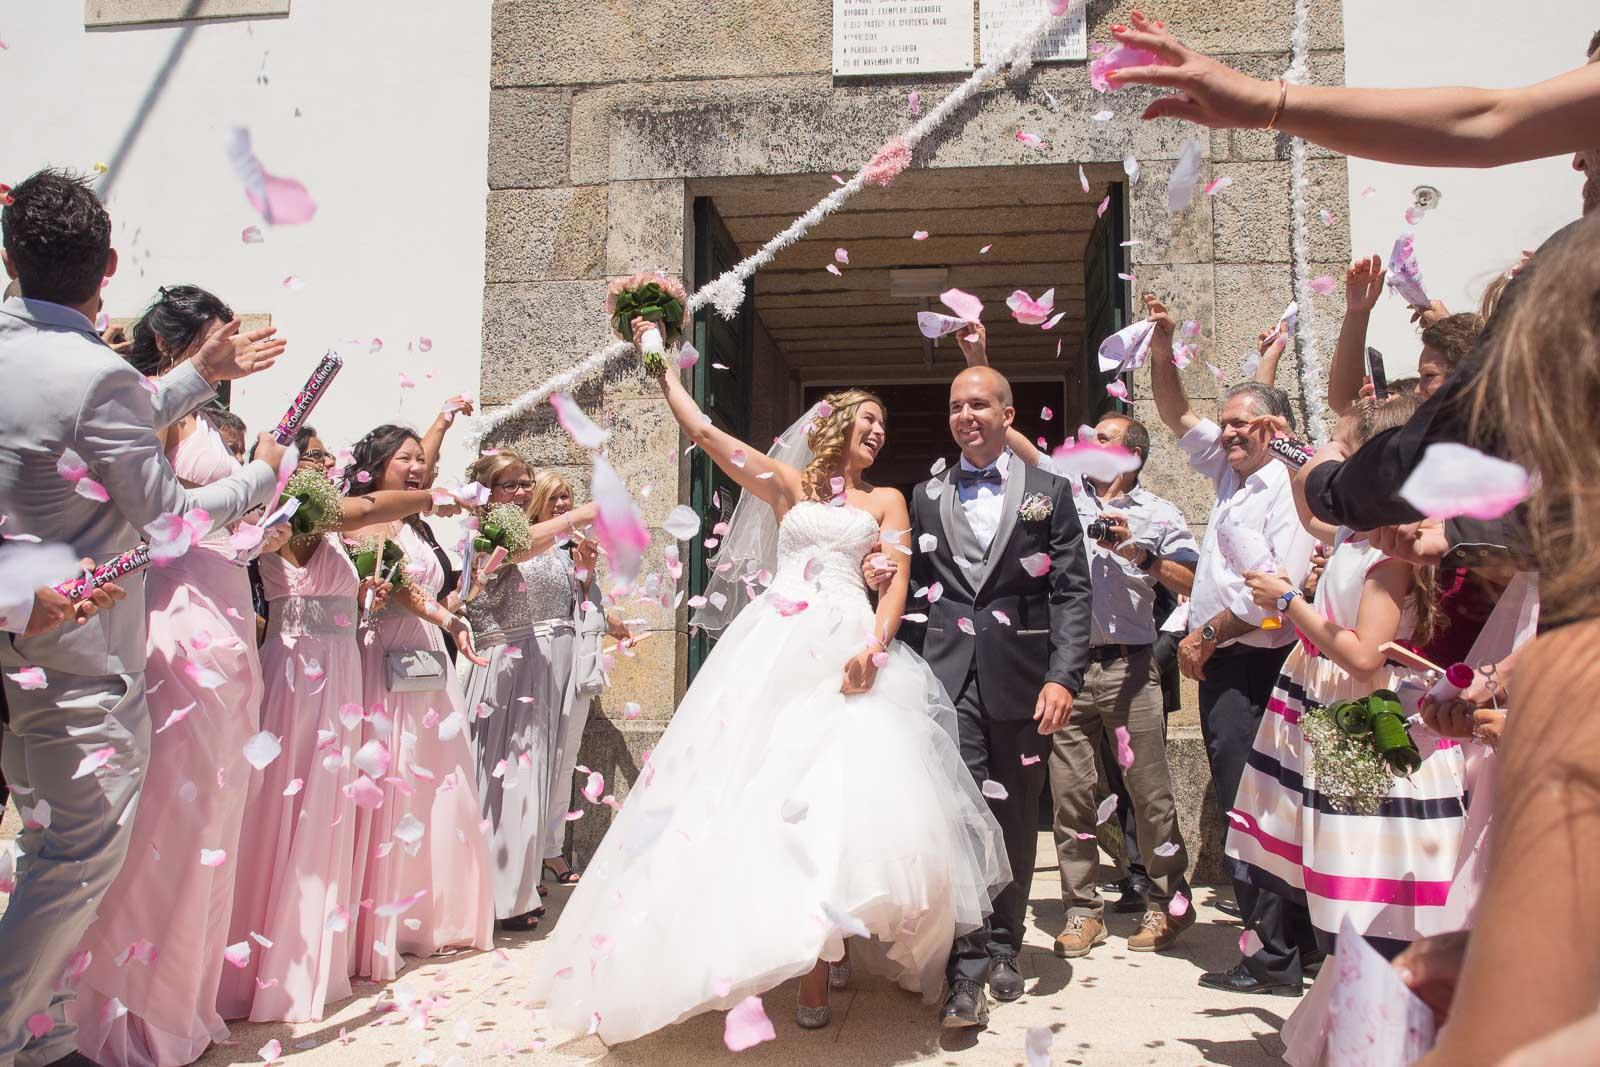 Sortie des mariés église de Queiriga Portugal. pétales de fleurs roses